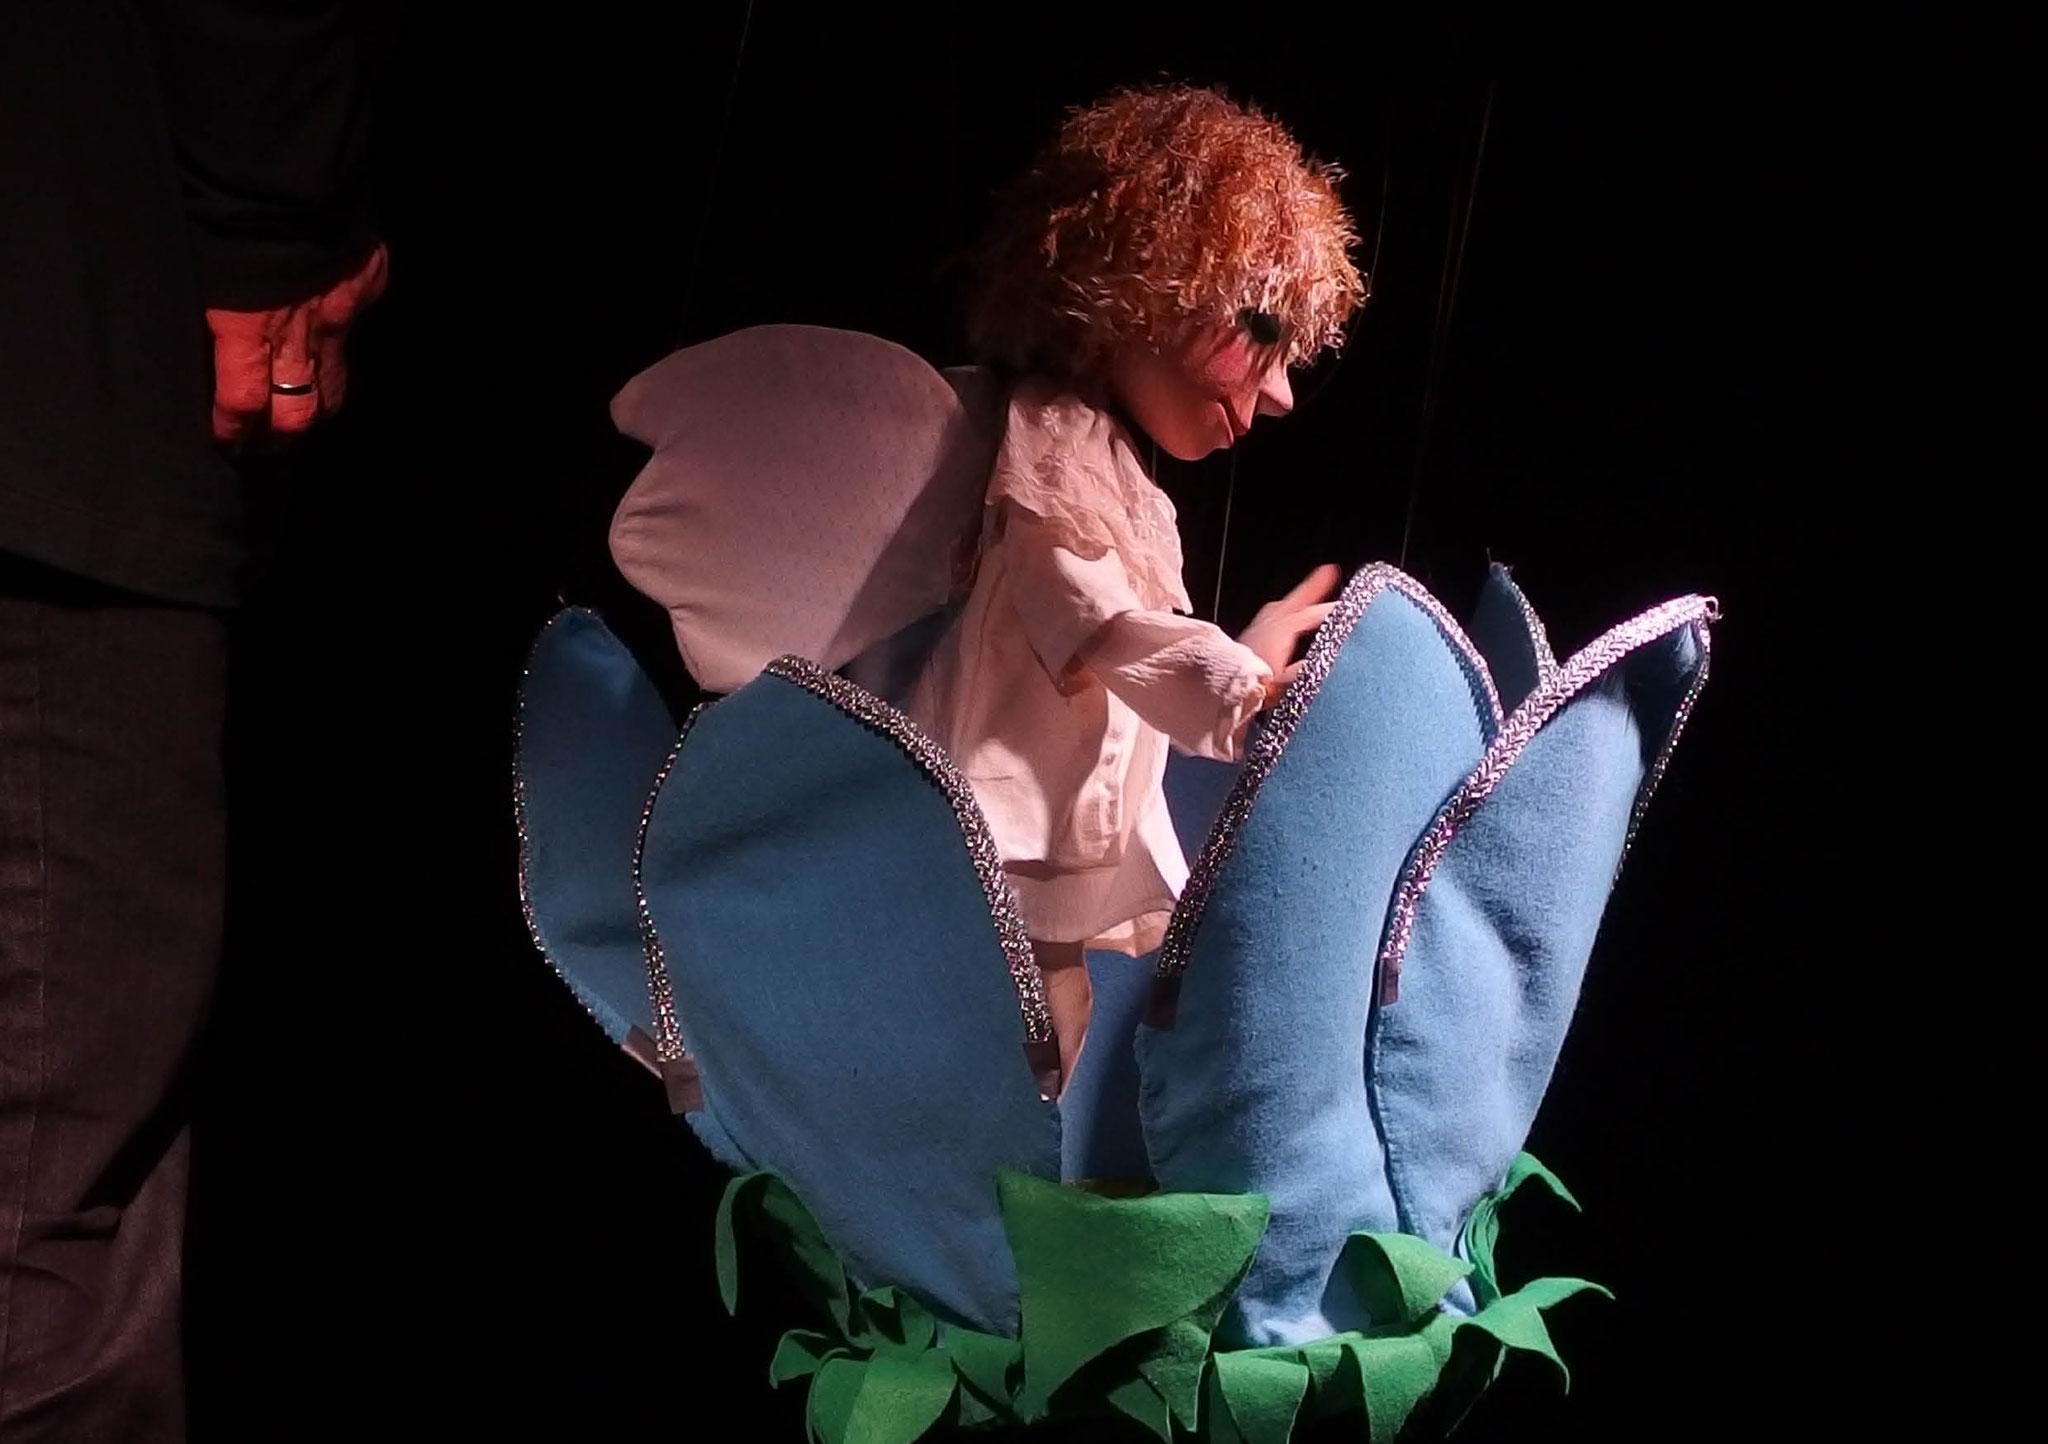 Marionettentheater Zaubervogel: Prinz Tulipan